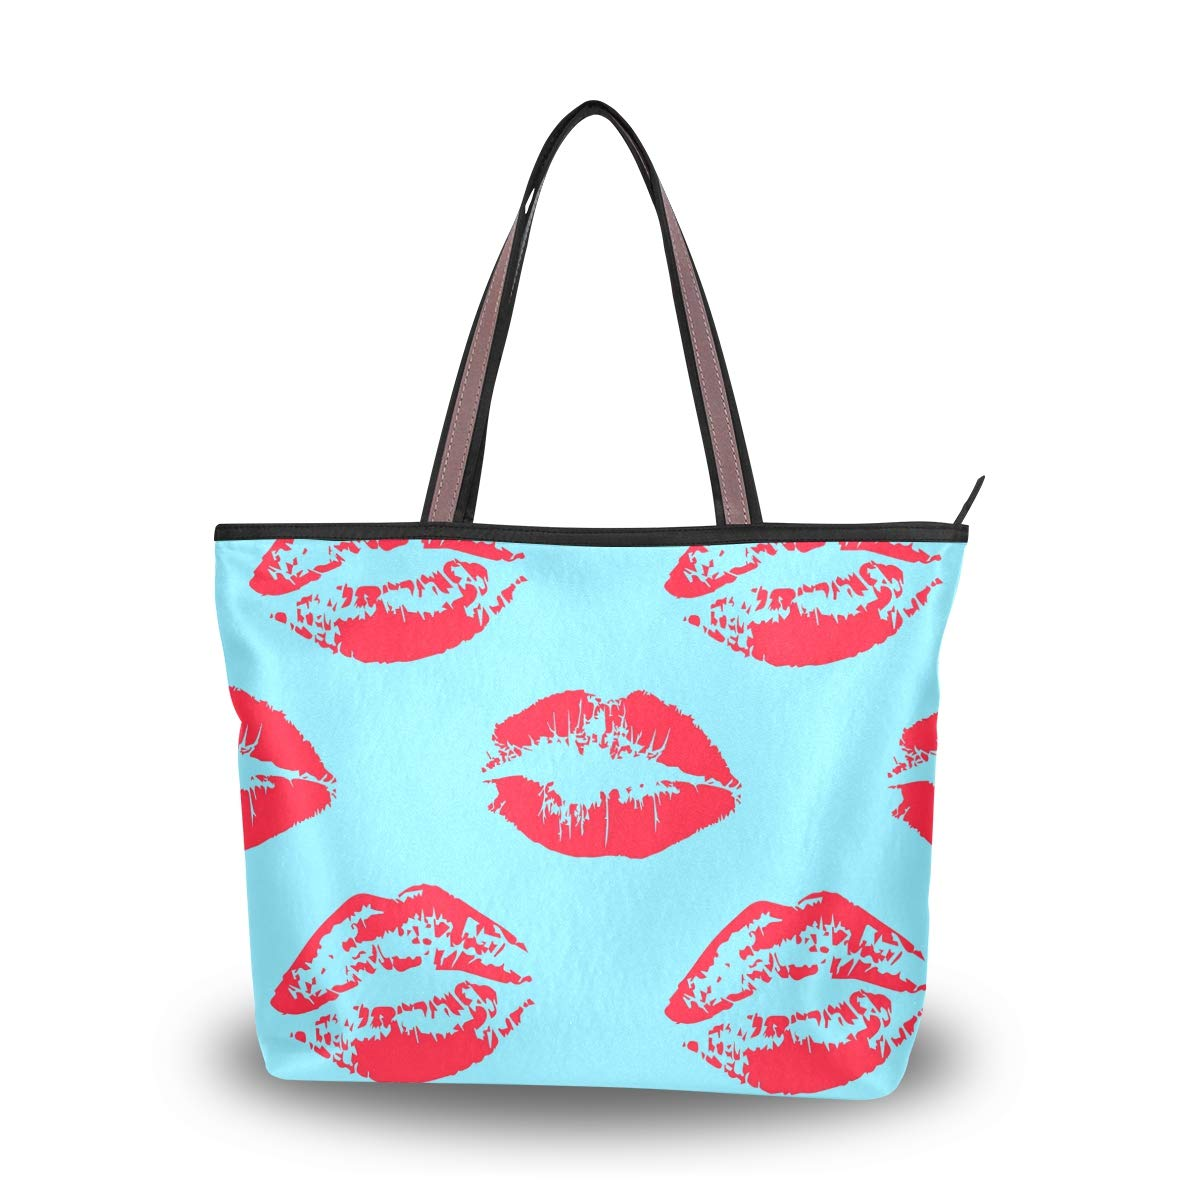 dff5234067b8 Red Lipstick Kiss Women Large Tote Top Handle Bags Shoulder Handbags ...